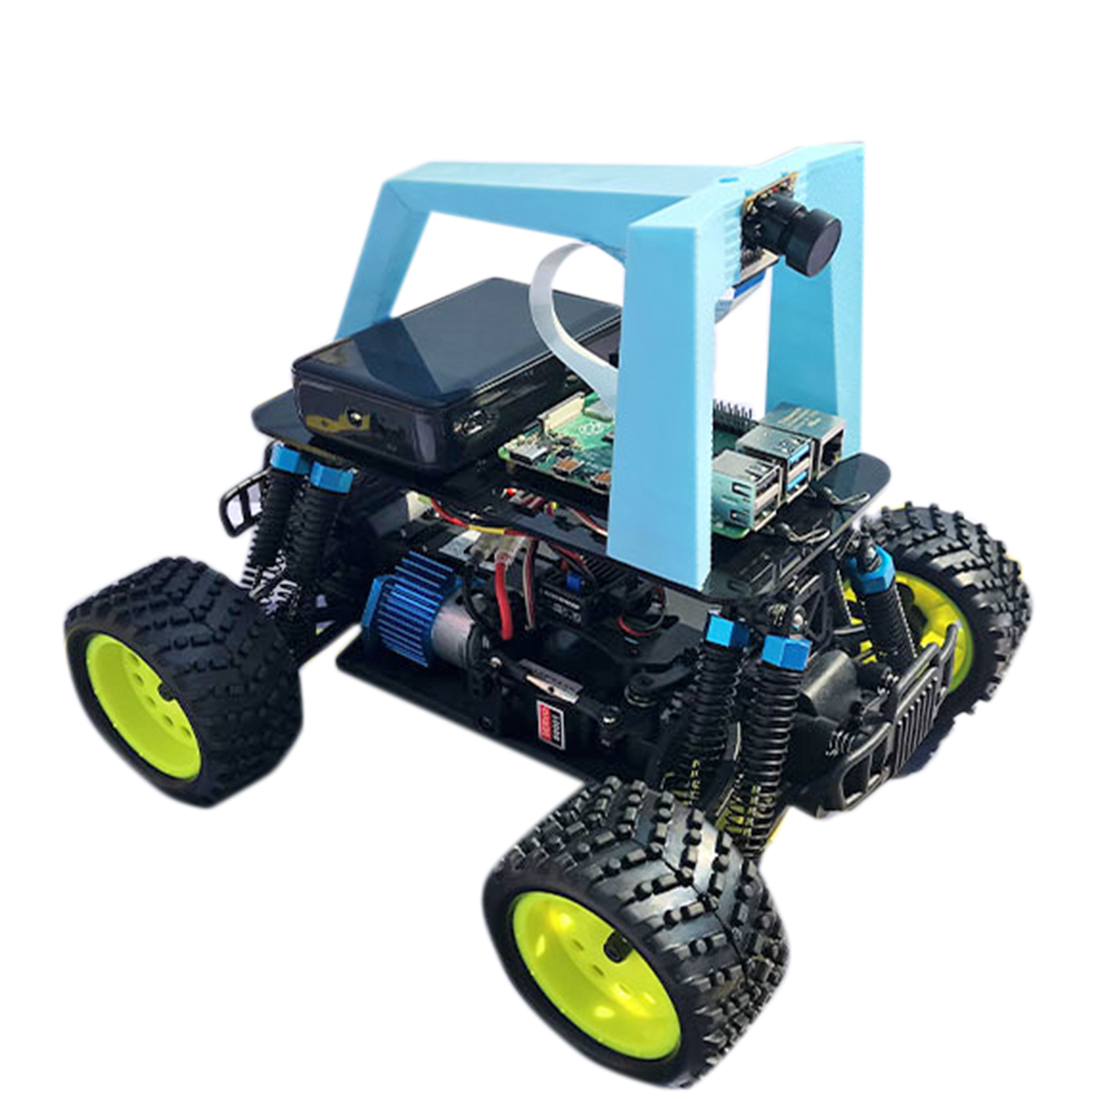 Artificial Intelligence Car Programmable Autopilot Donkey Robot Car Kit With Racing Track For Jetson Nano Development Board